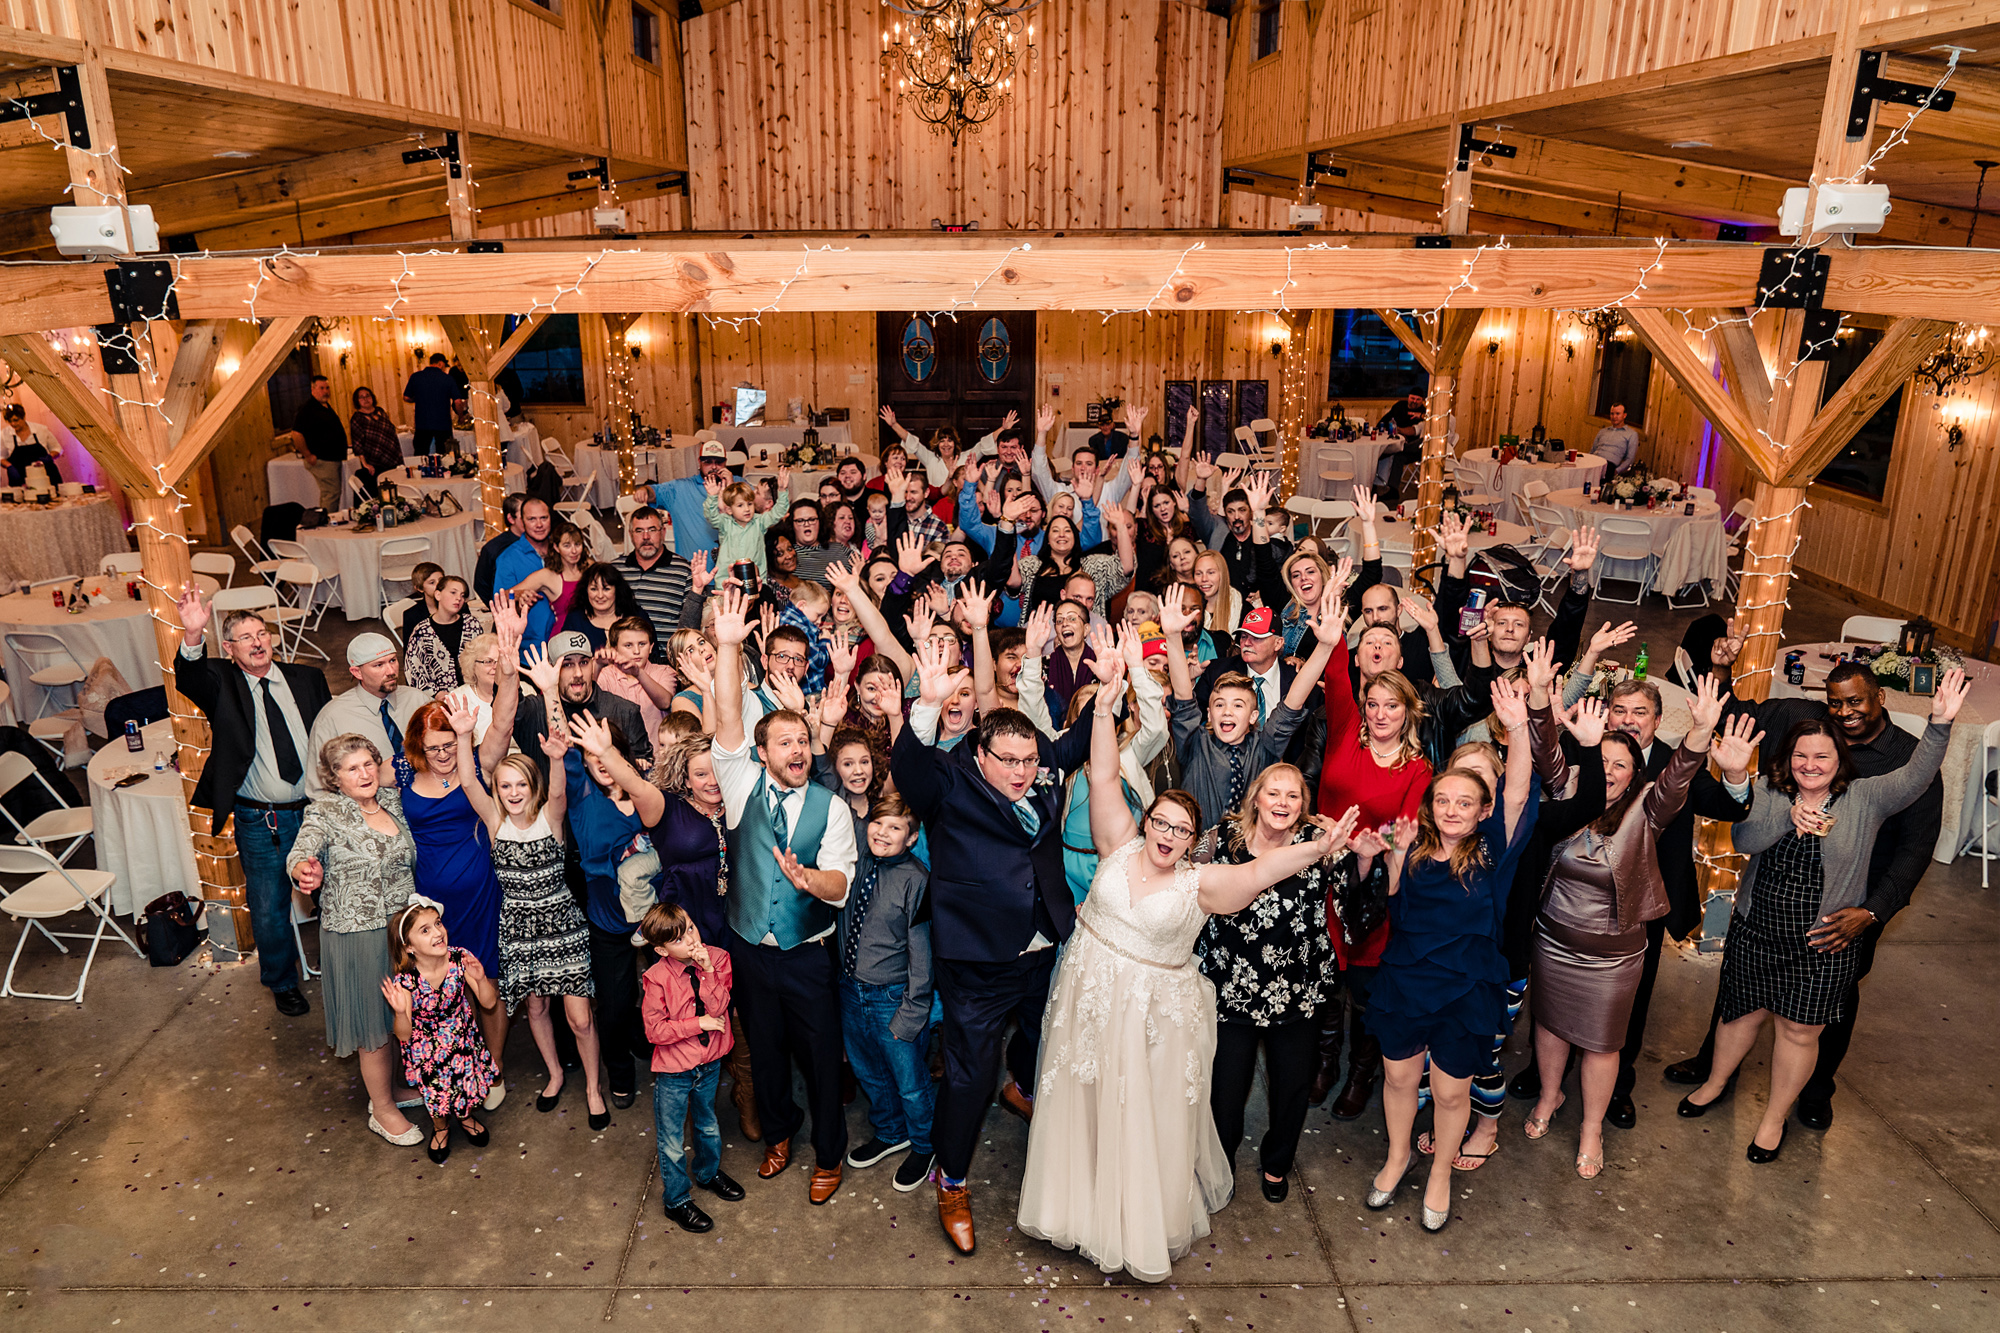 Silver-Creek-Stables-Wedding-Photography-21.jpg